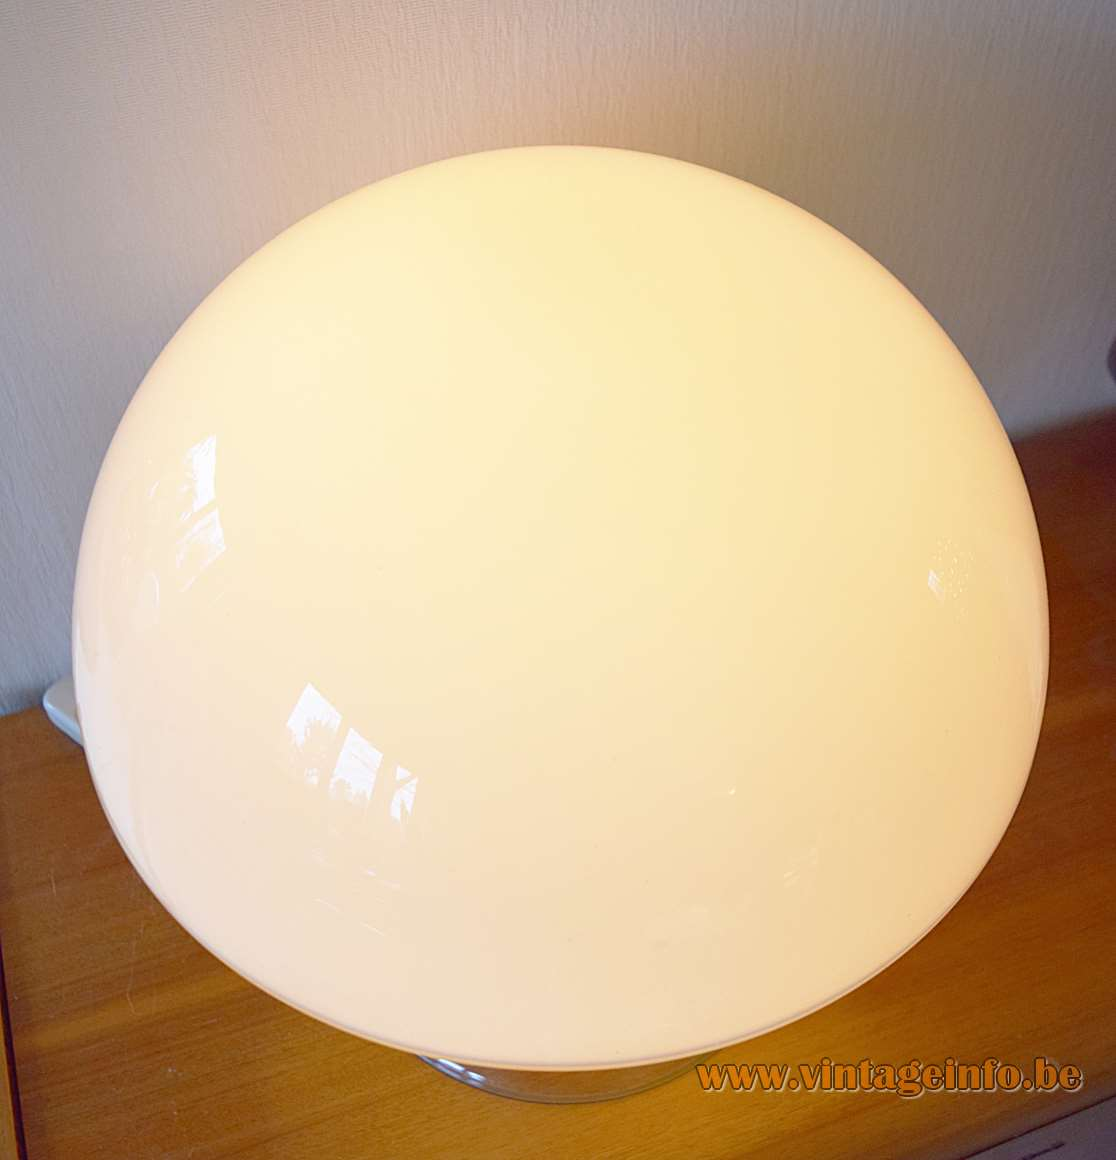 Vistosi Cumulus table lamp clear & white mushroom Murano glass lampshade design: Enrico Capuzzo 1960s 1970s Italy